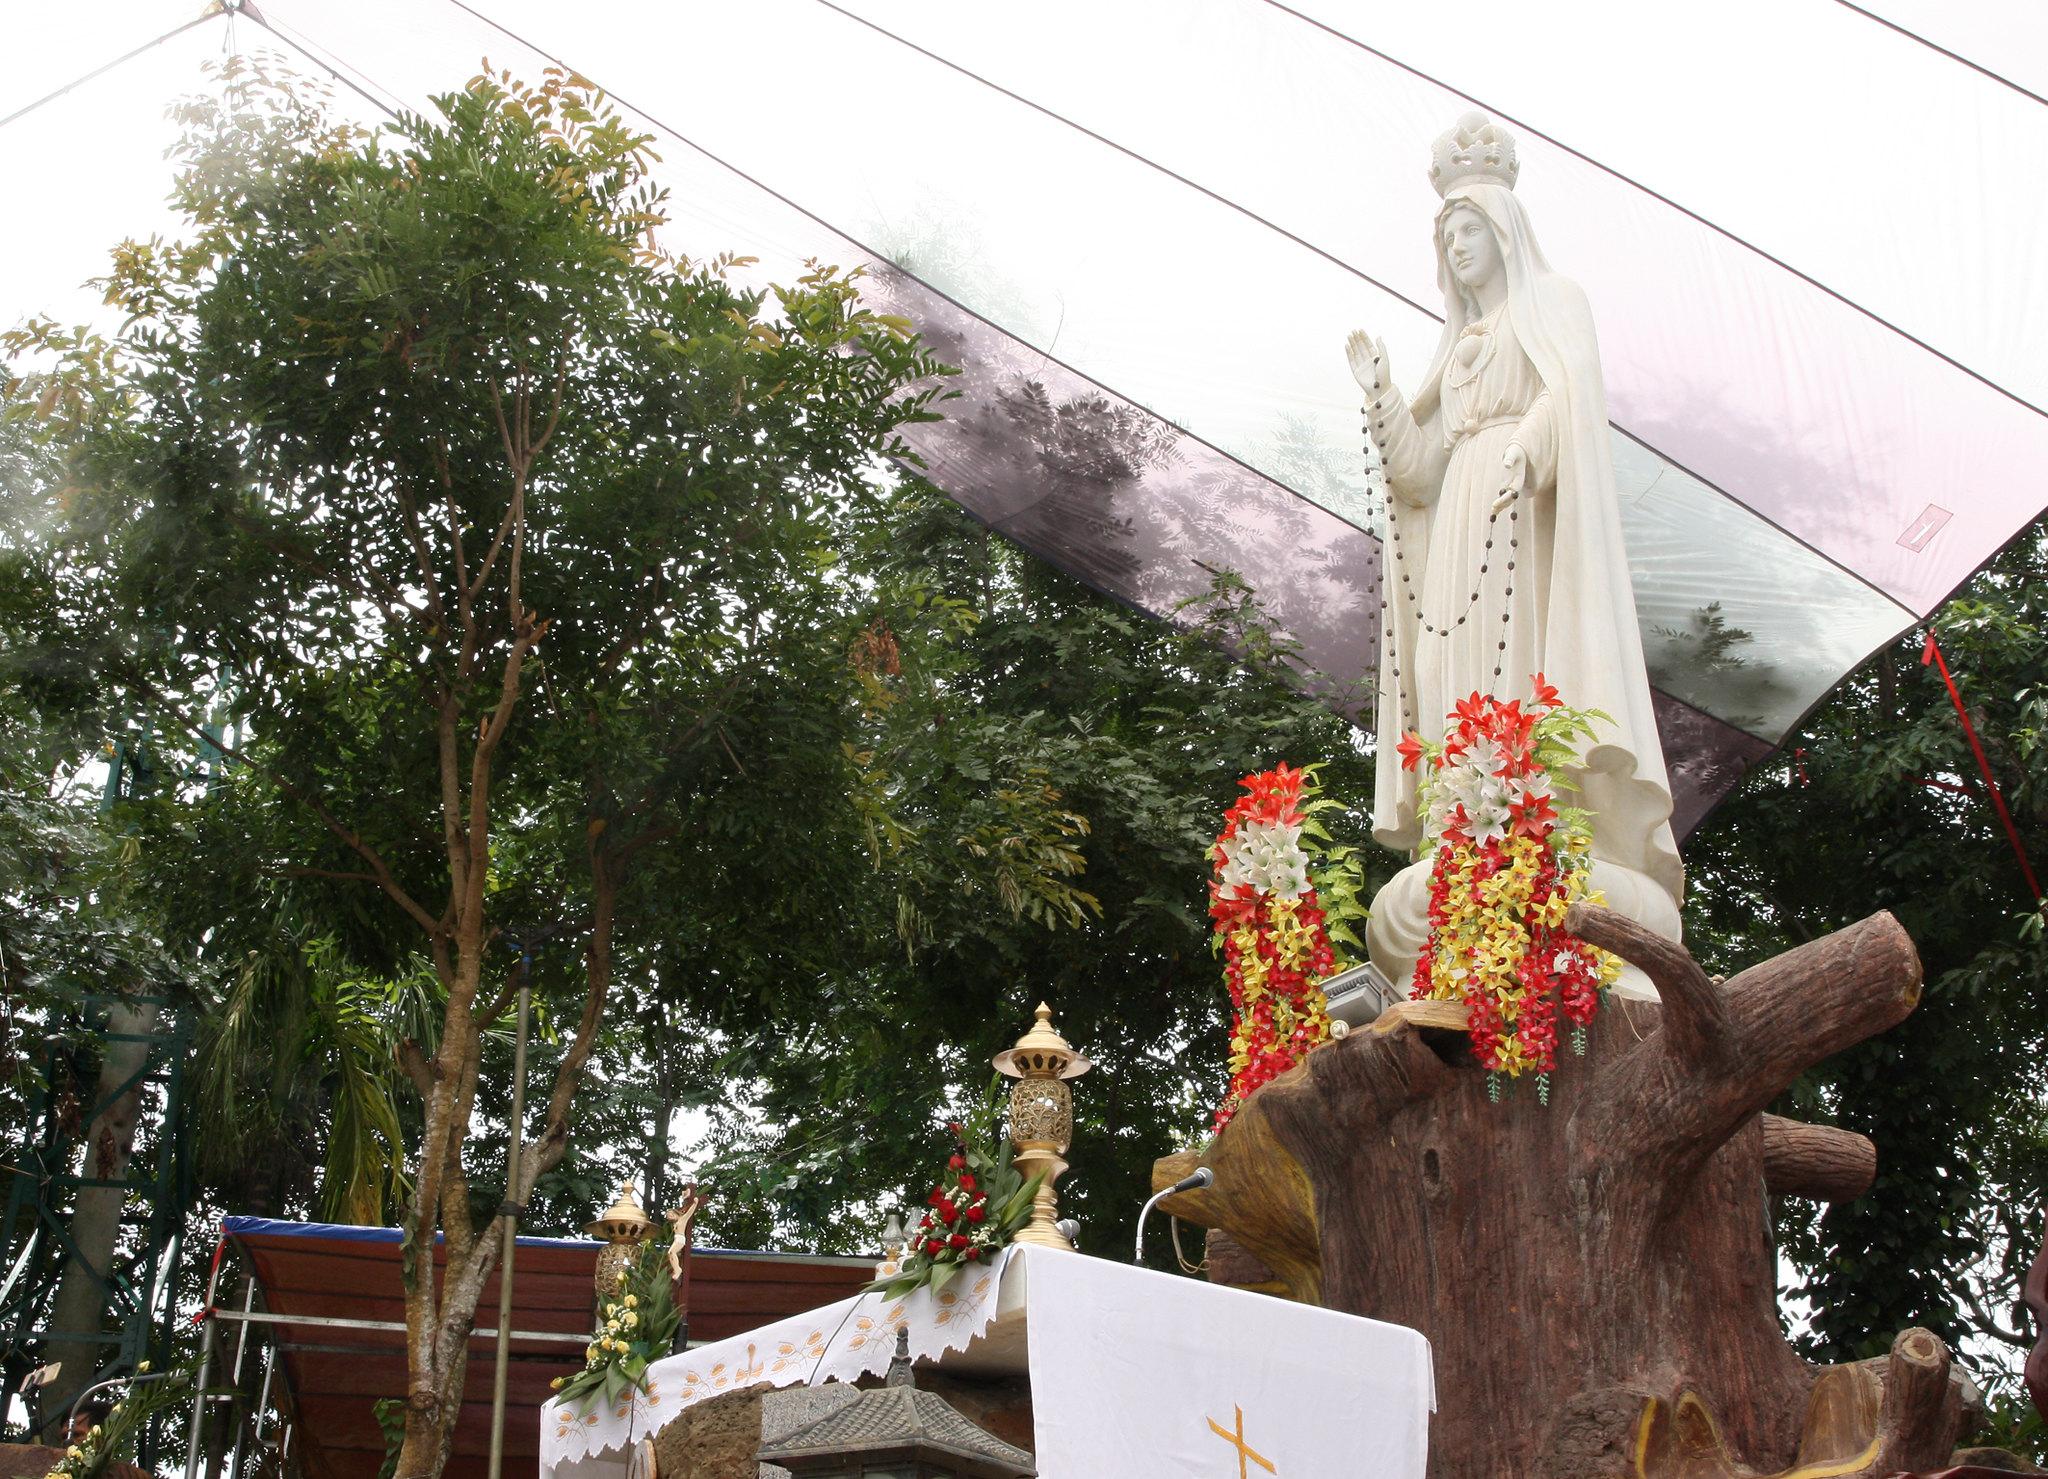 Kỷ niệm 100 năm Đức Mẹ Fatima